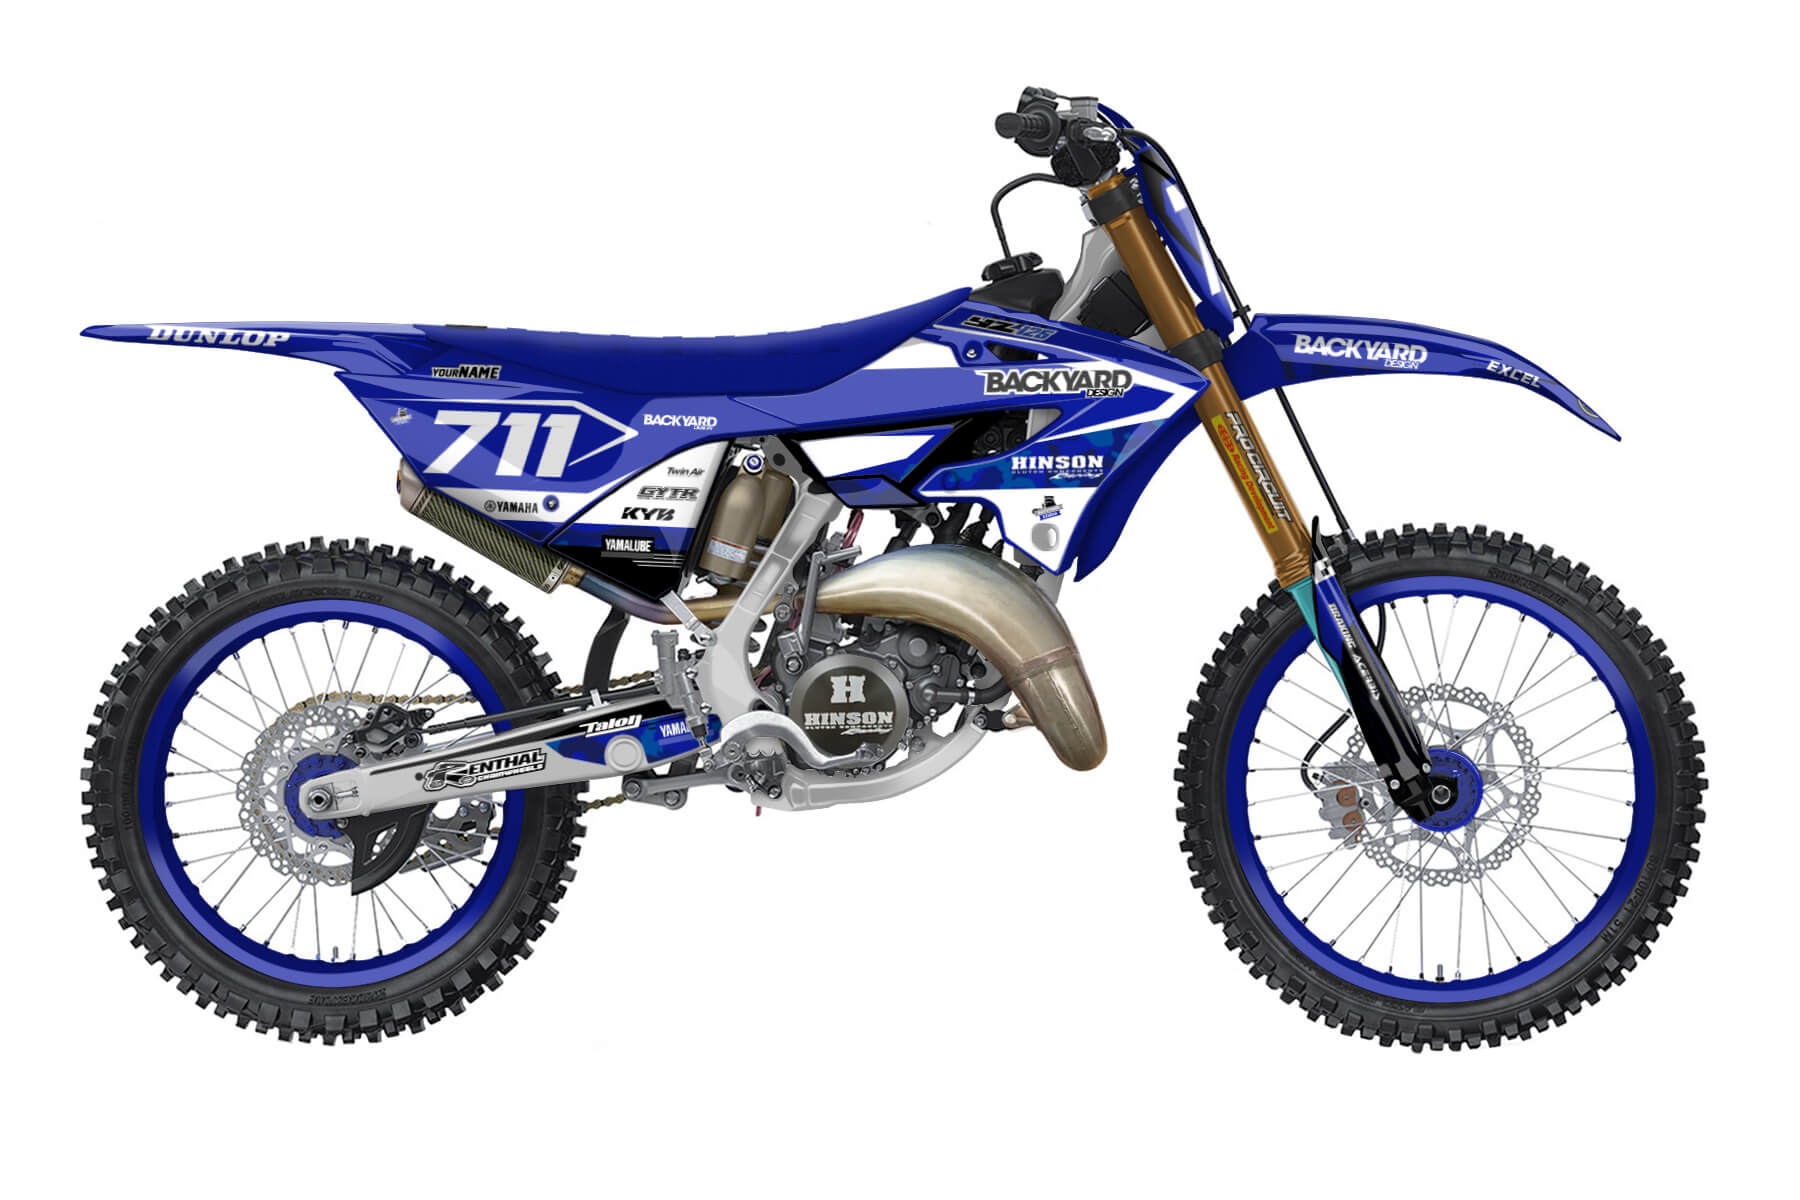 Yamaha YZ 250 - 2022 - Backyard Design - Mx Dekor - Pattern Basic